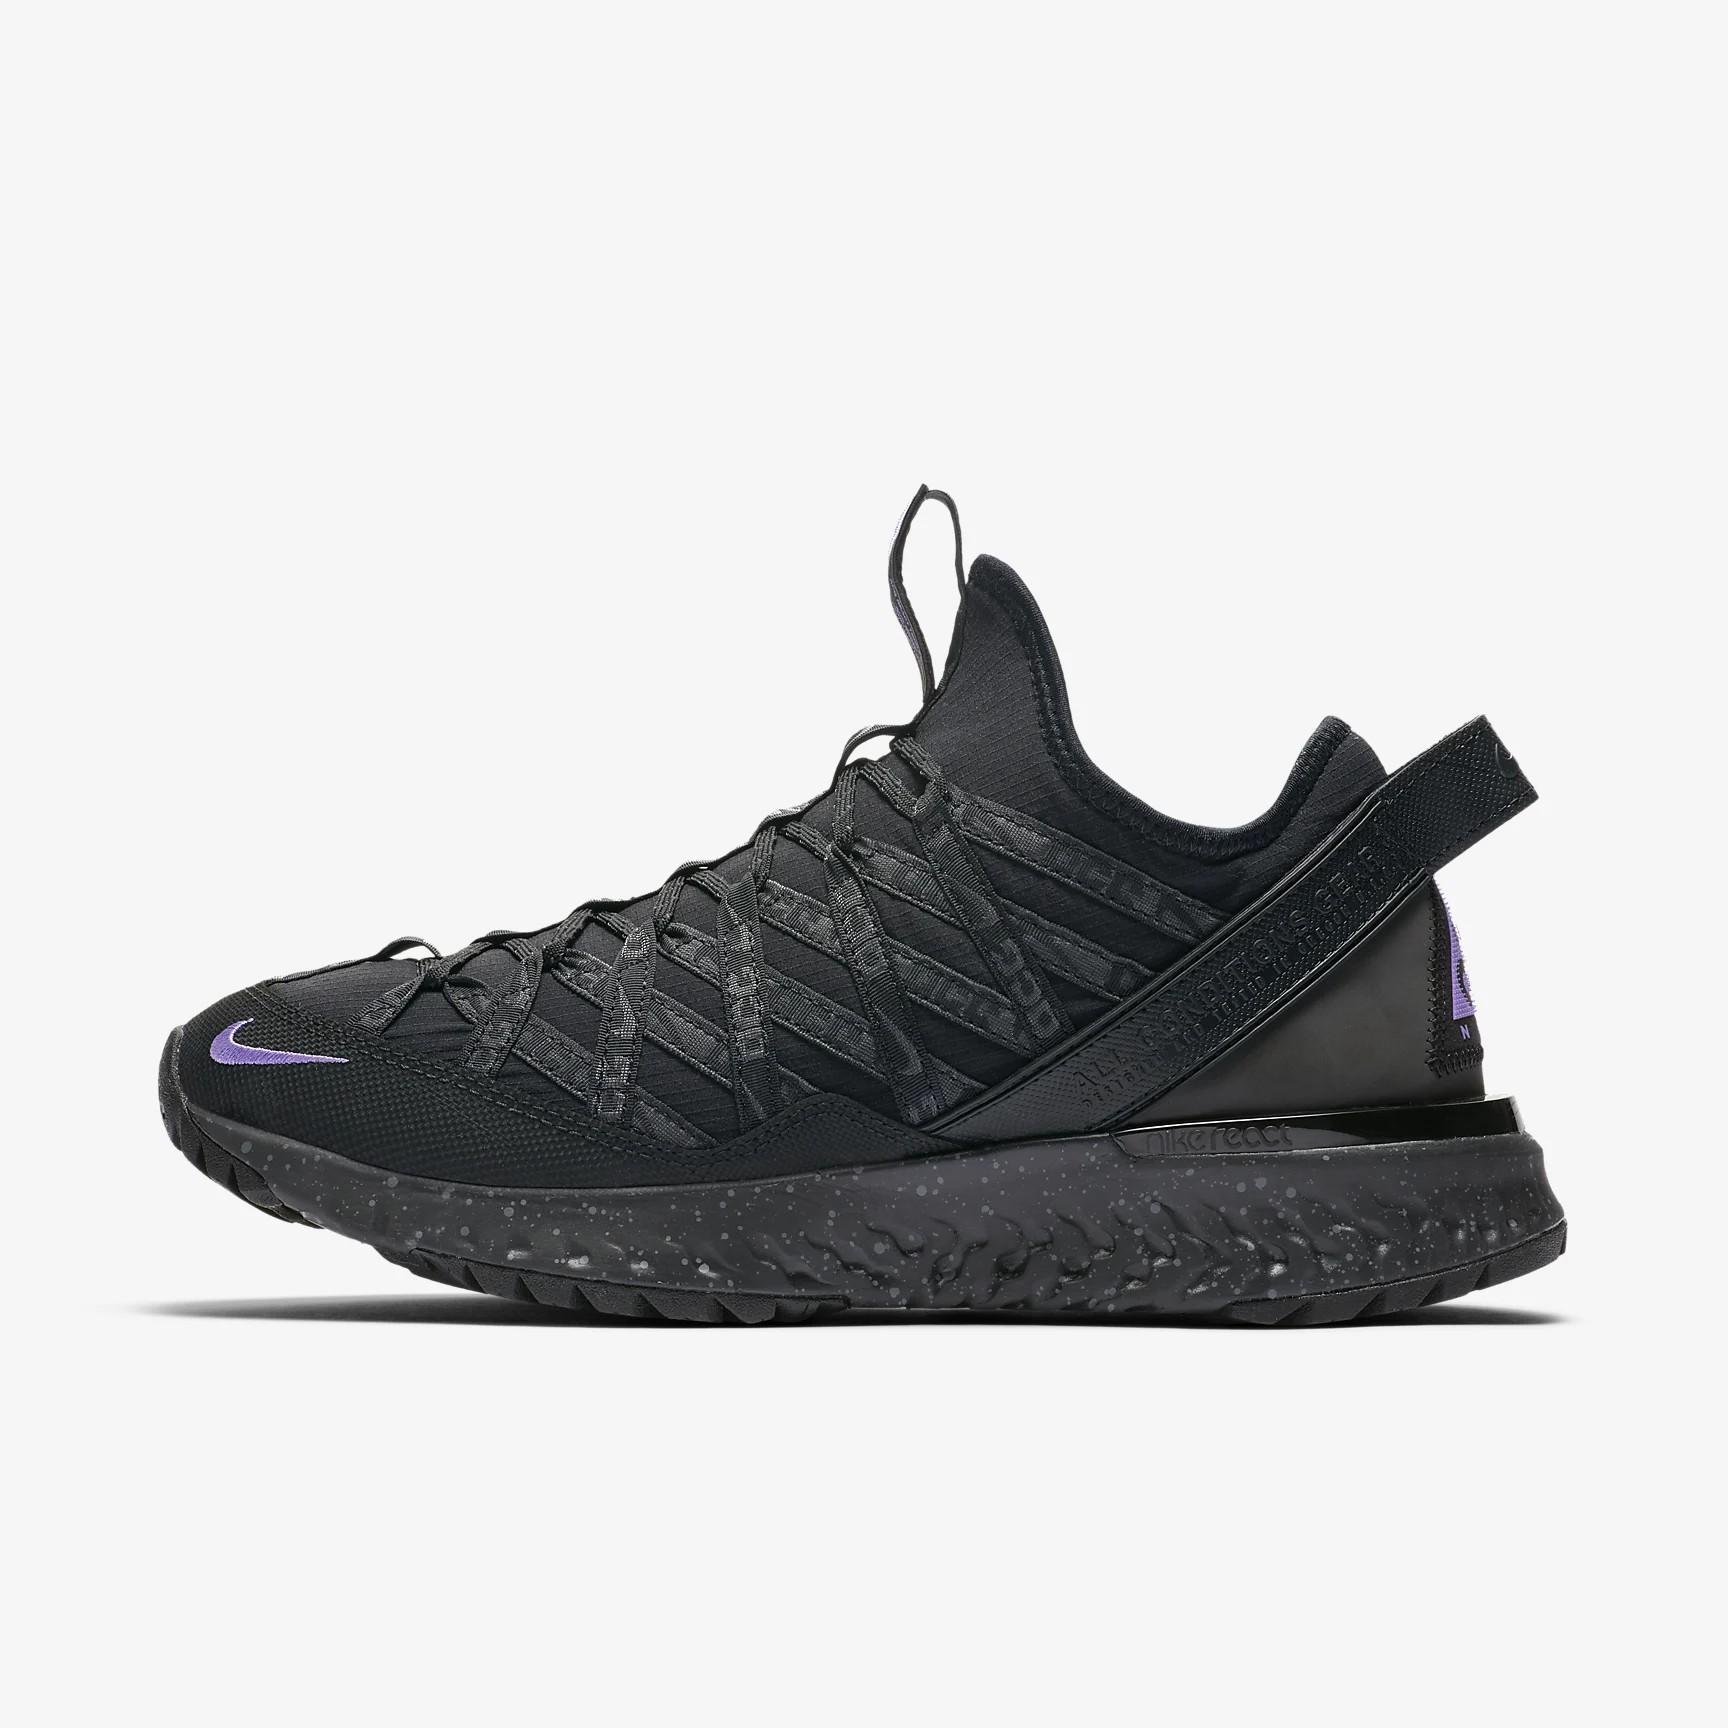 ▲黑魂球鞋。 (图/翻摄自Goldwin、Adidas、Nike、Kith、SSENSE)